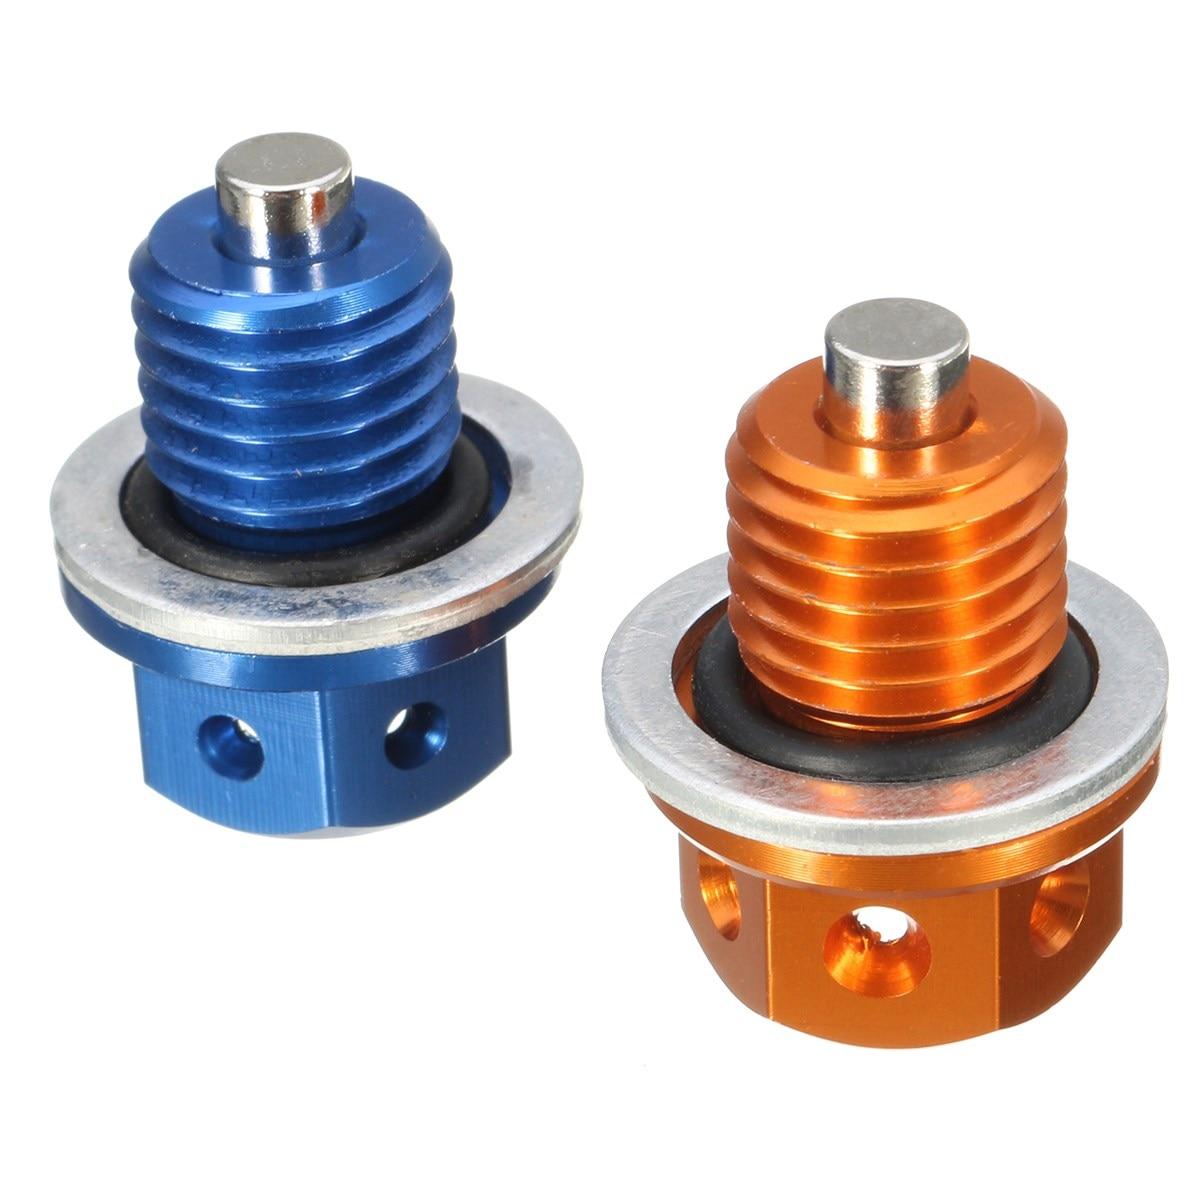 М12 оранжевый/синий ЧПУ для слива масла штепсельная Вилка для KTM 690 герцог 09-16 450 505 525 SX с/ХС АТВ